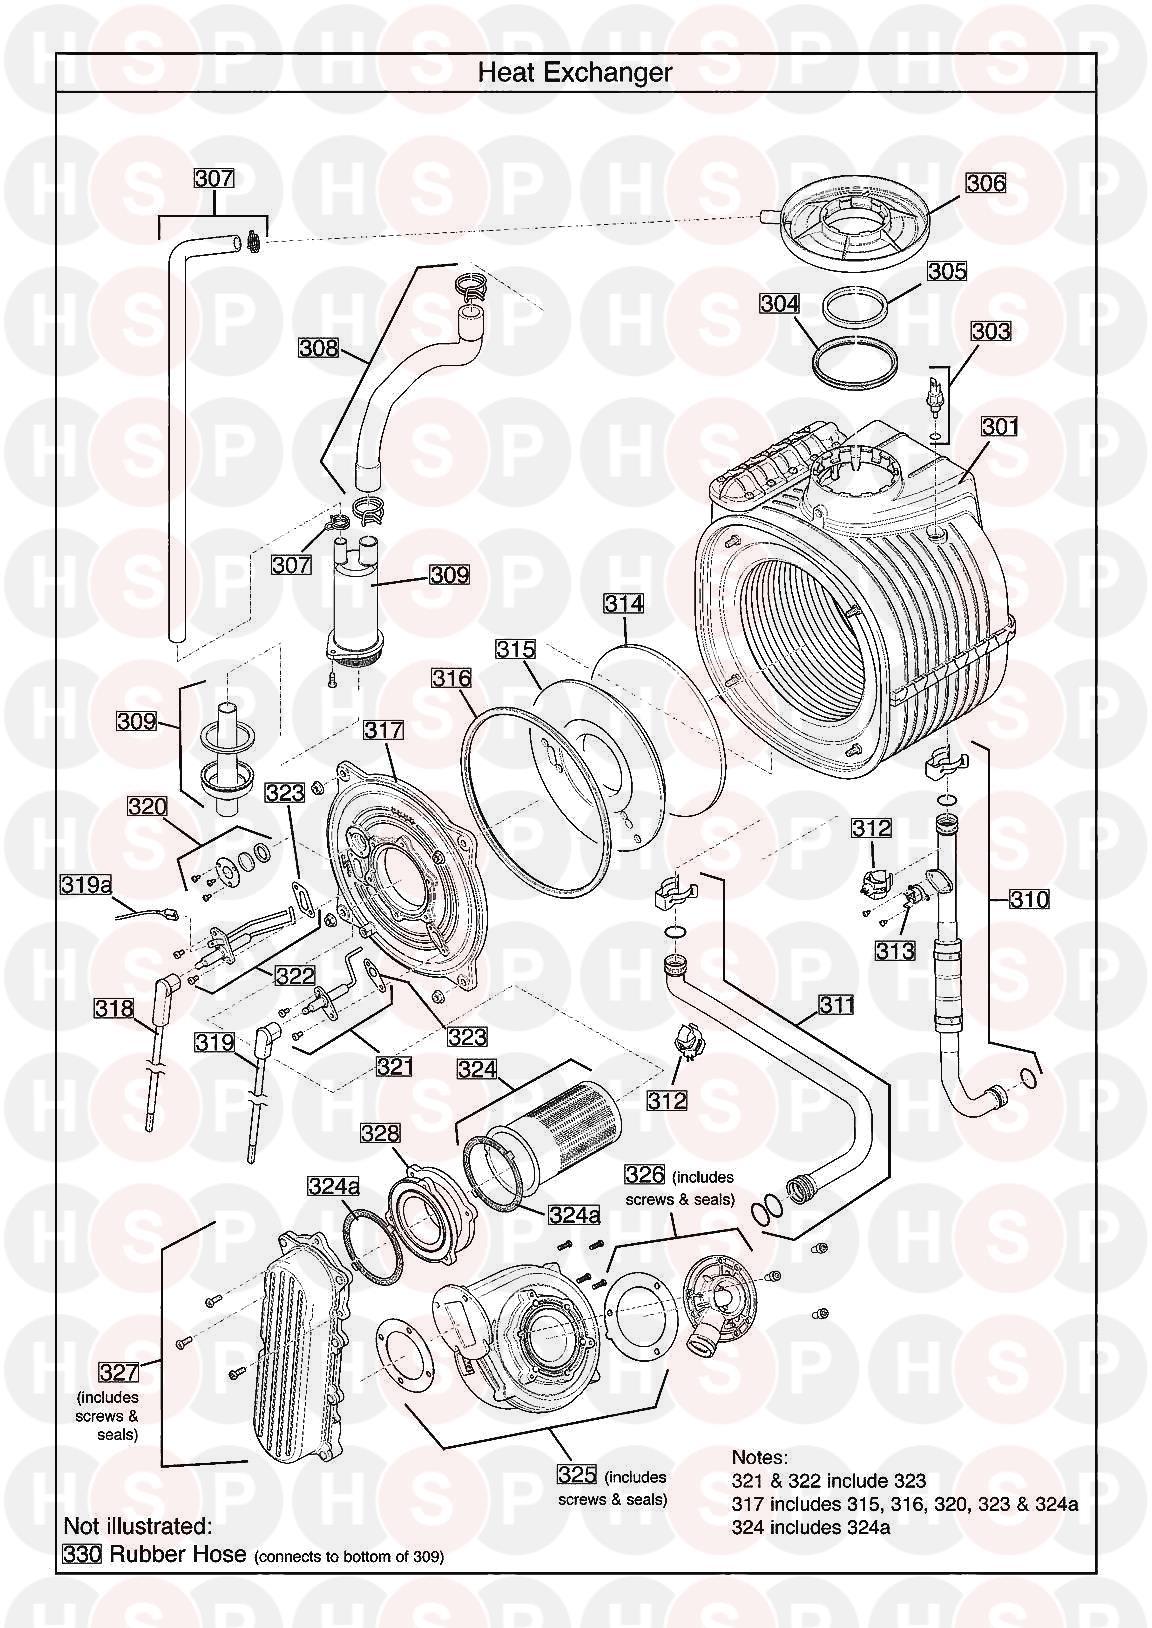 baxi megaflo 2 system 24 compact ga appliance diagram